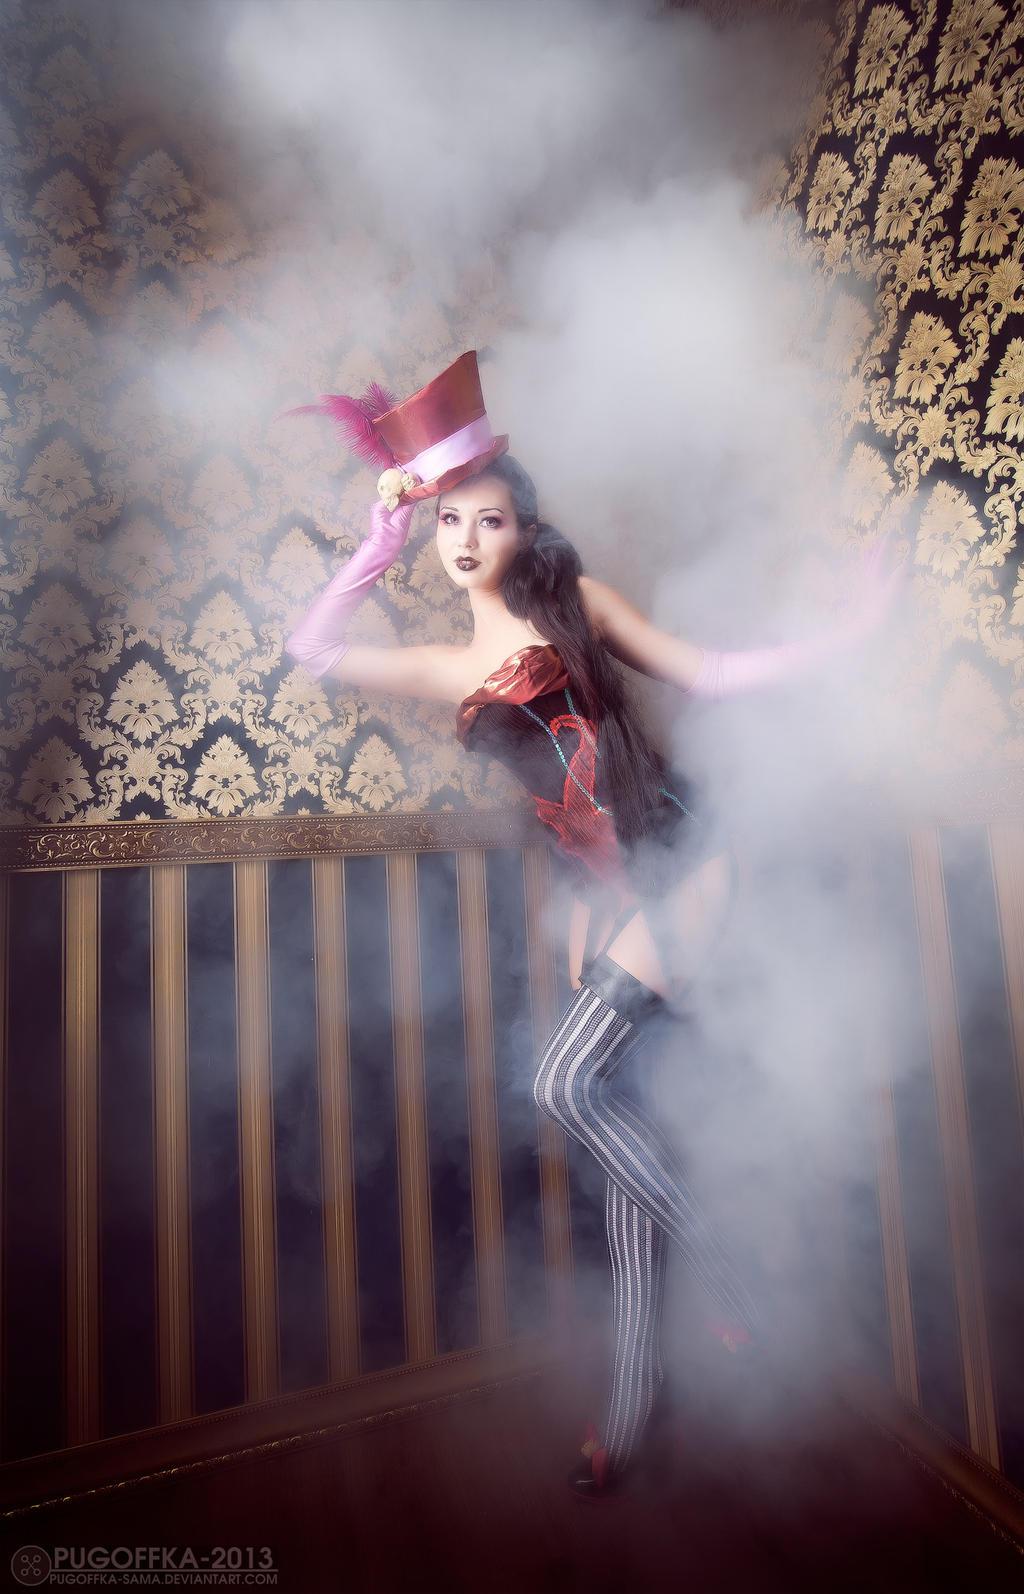 Marvel - Lady Satana - Women of Marvel by Pugoffka-sama